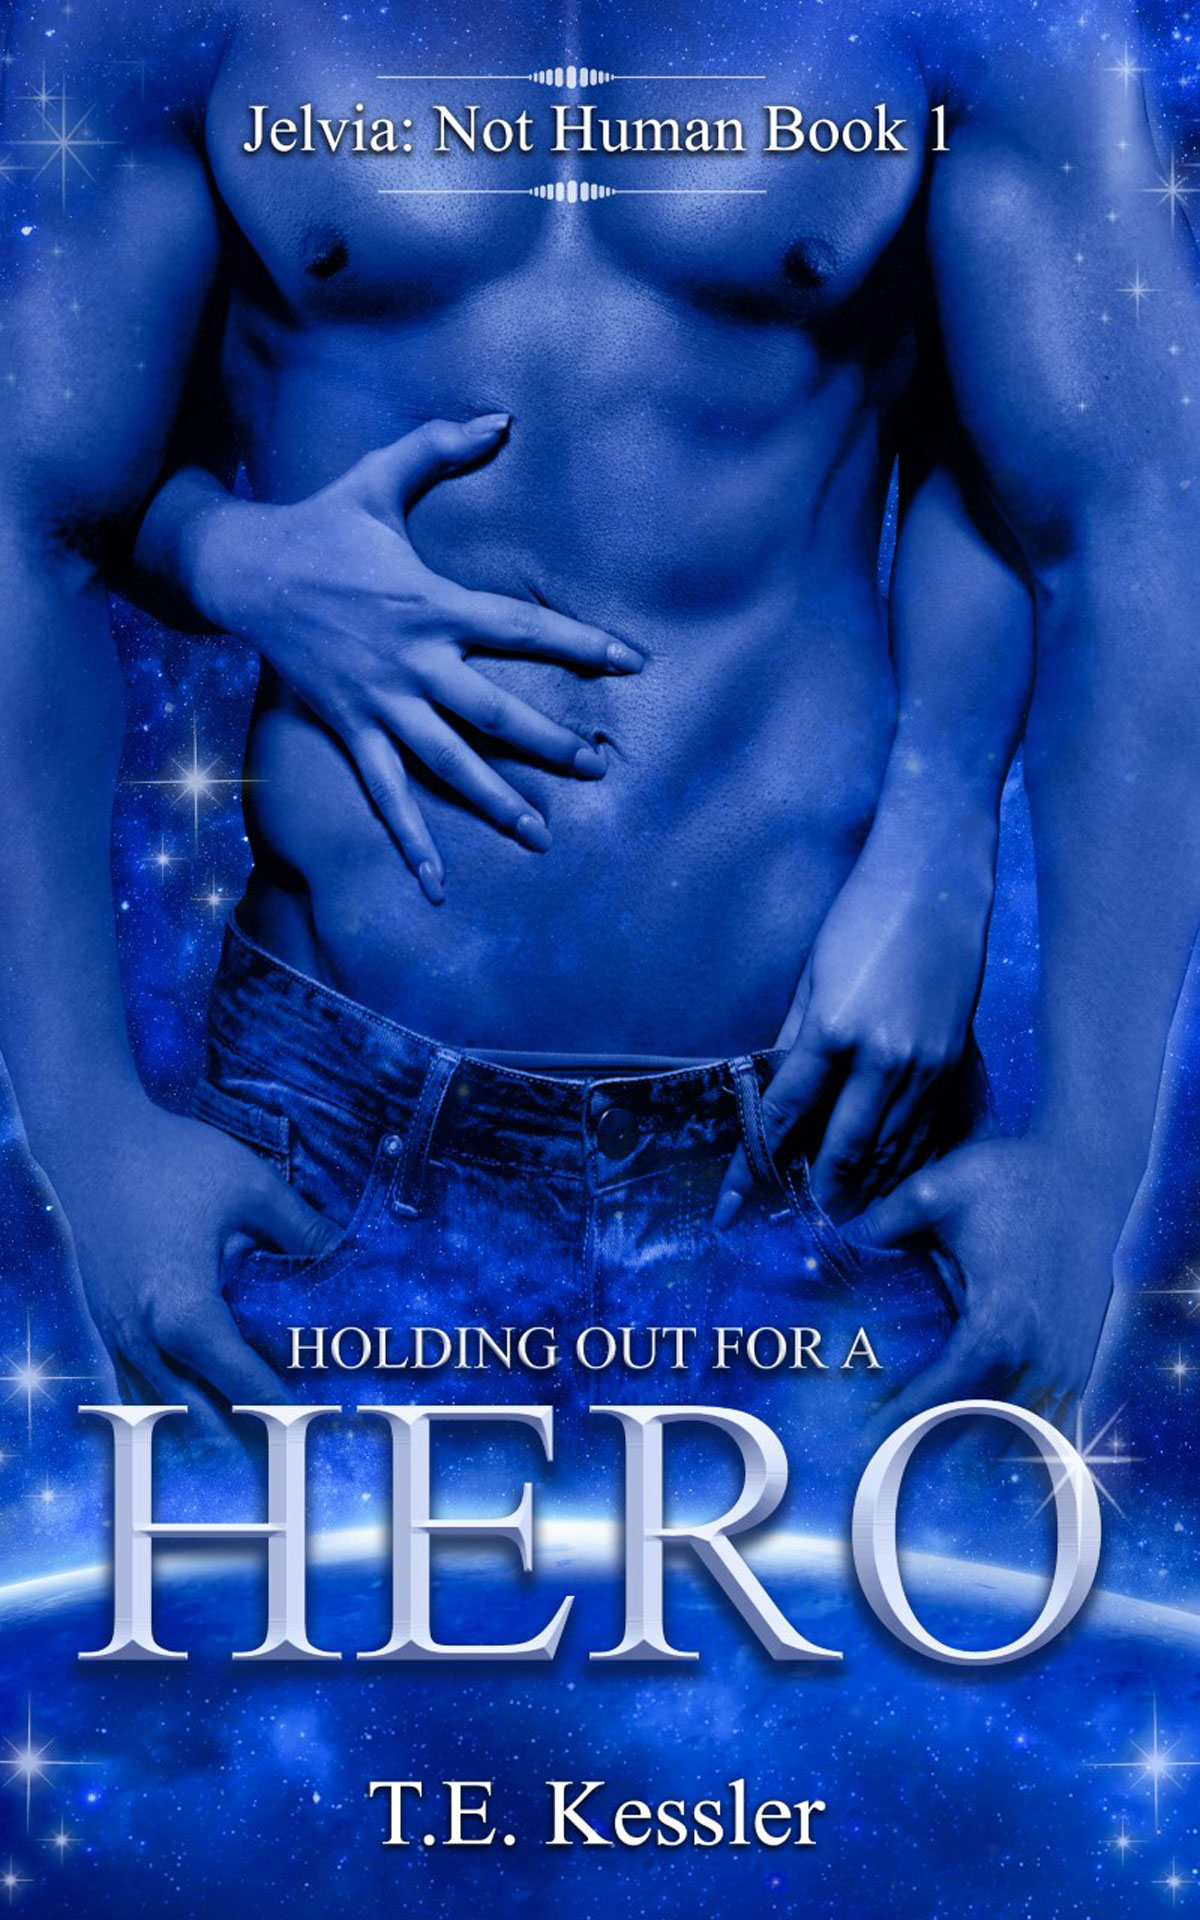 Holding Out for a Hero by T.E. Kessler @TE_Kessler @zooloo2008